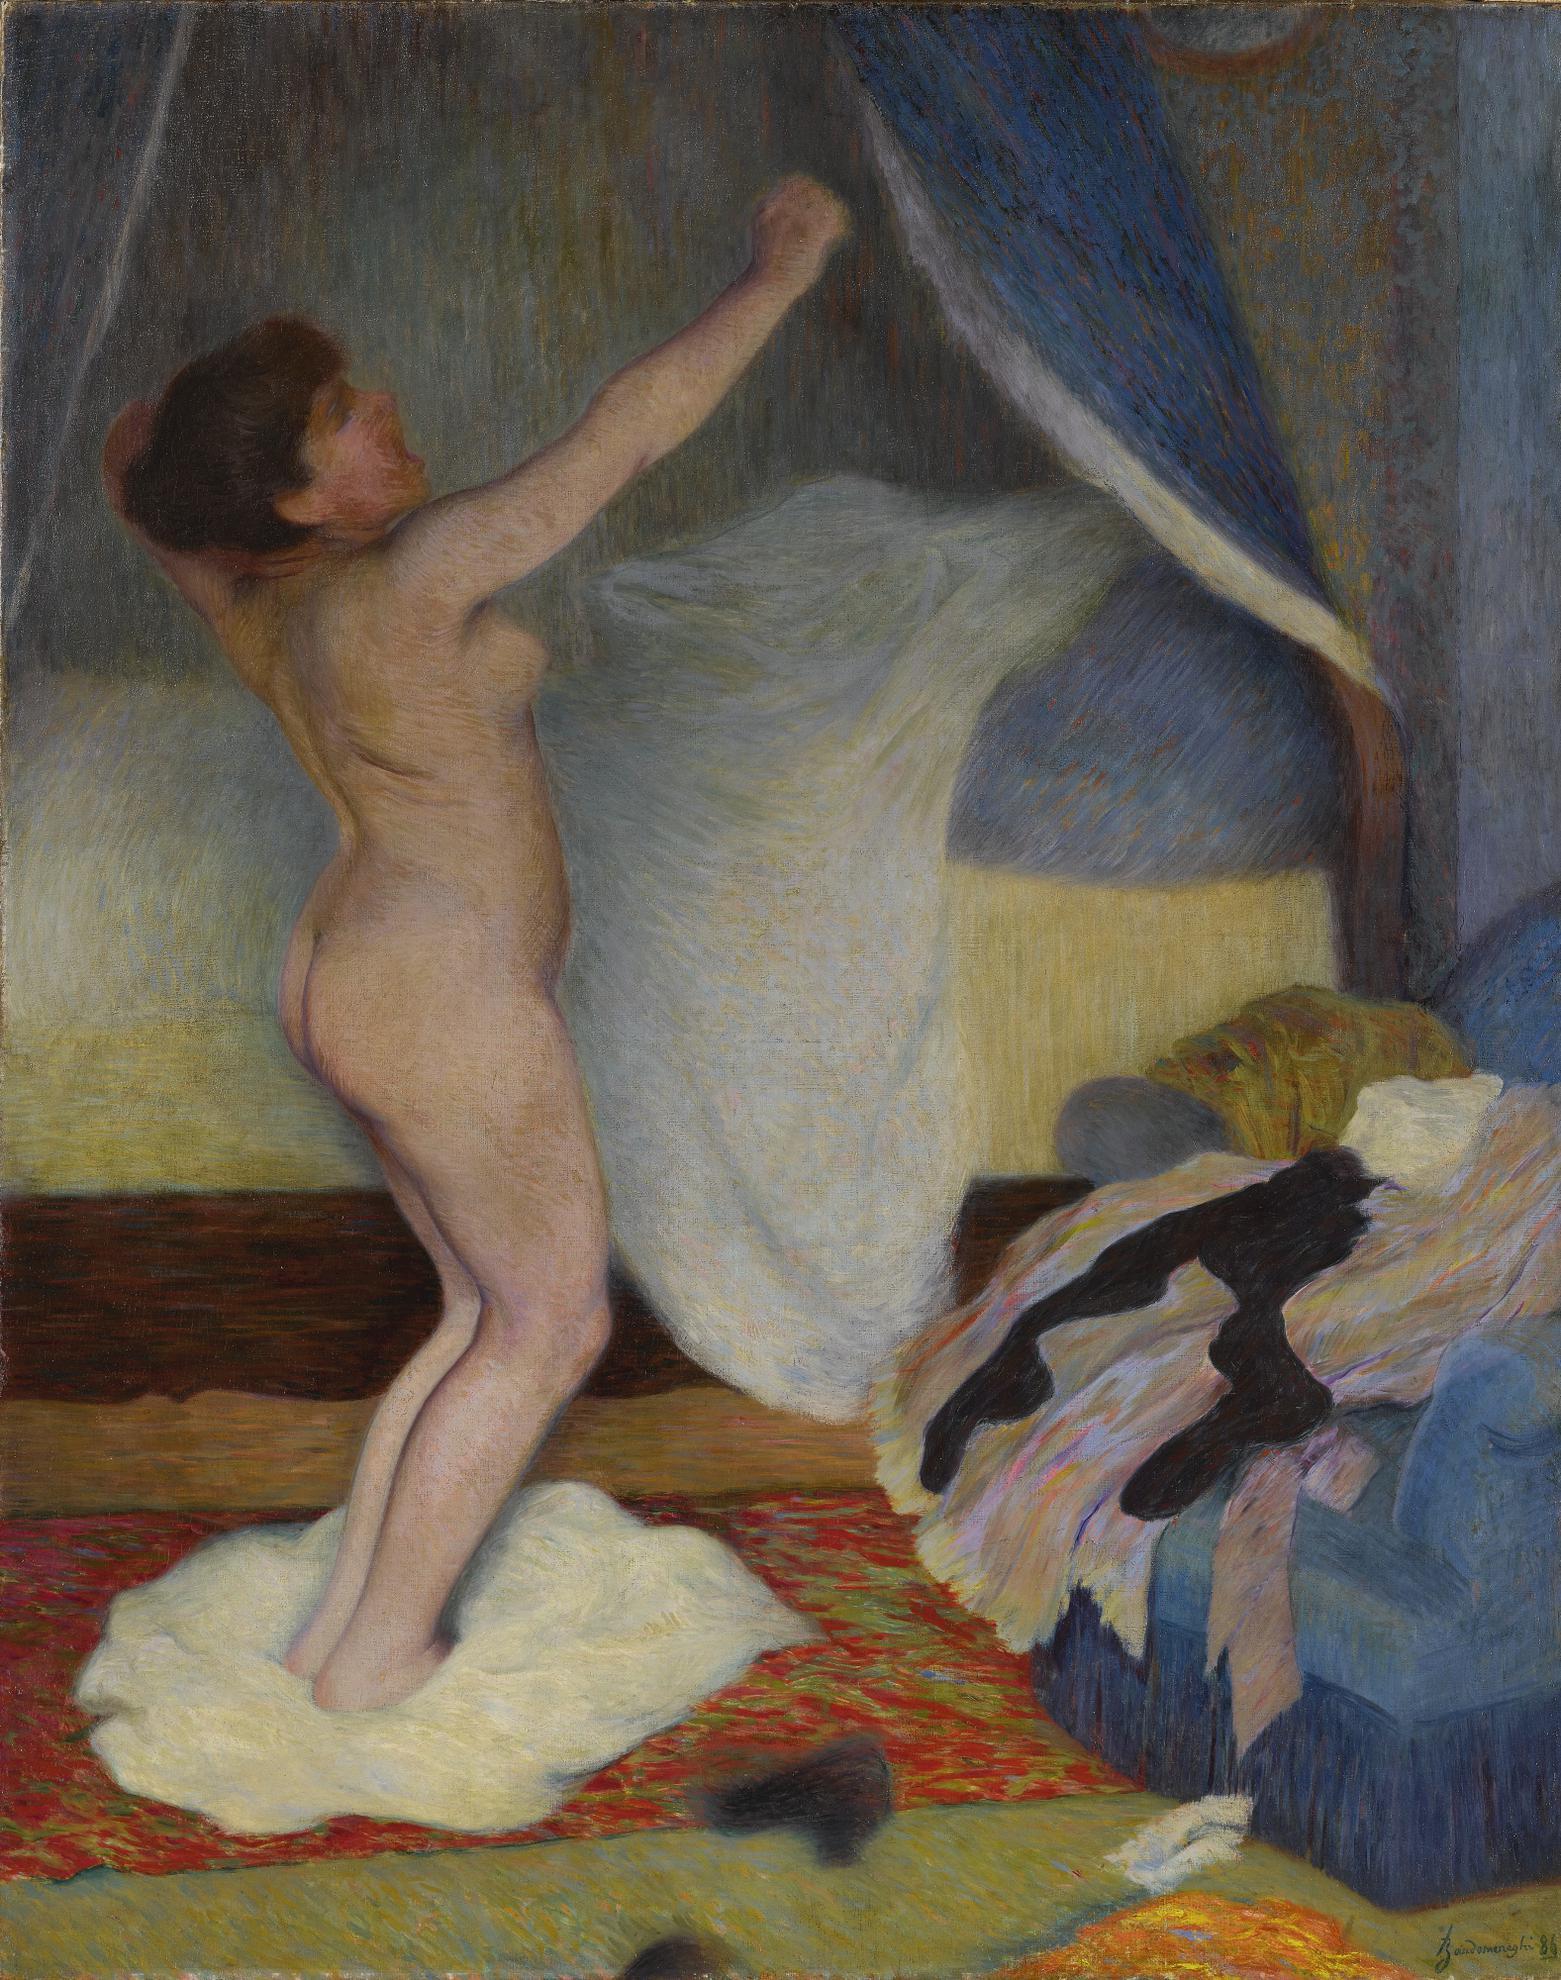 Federico Zandomeneghi-Le Lever: Femme Setirant-1886